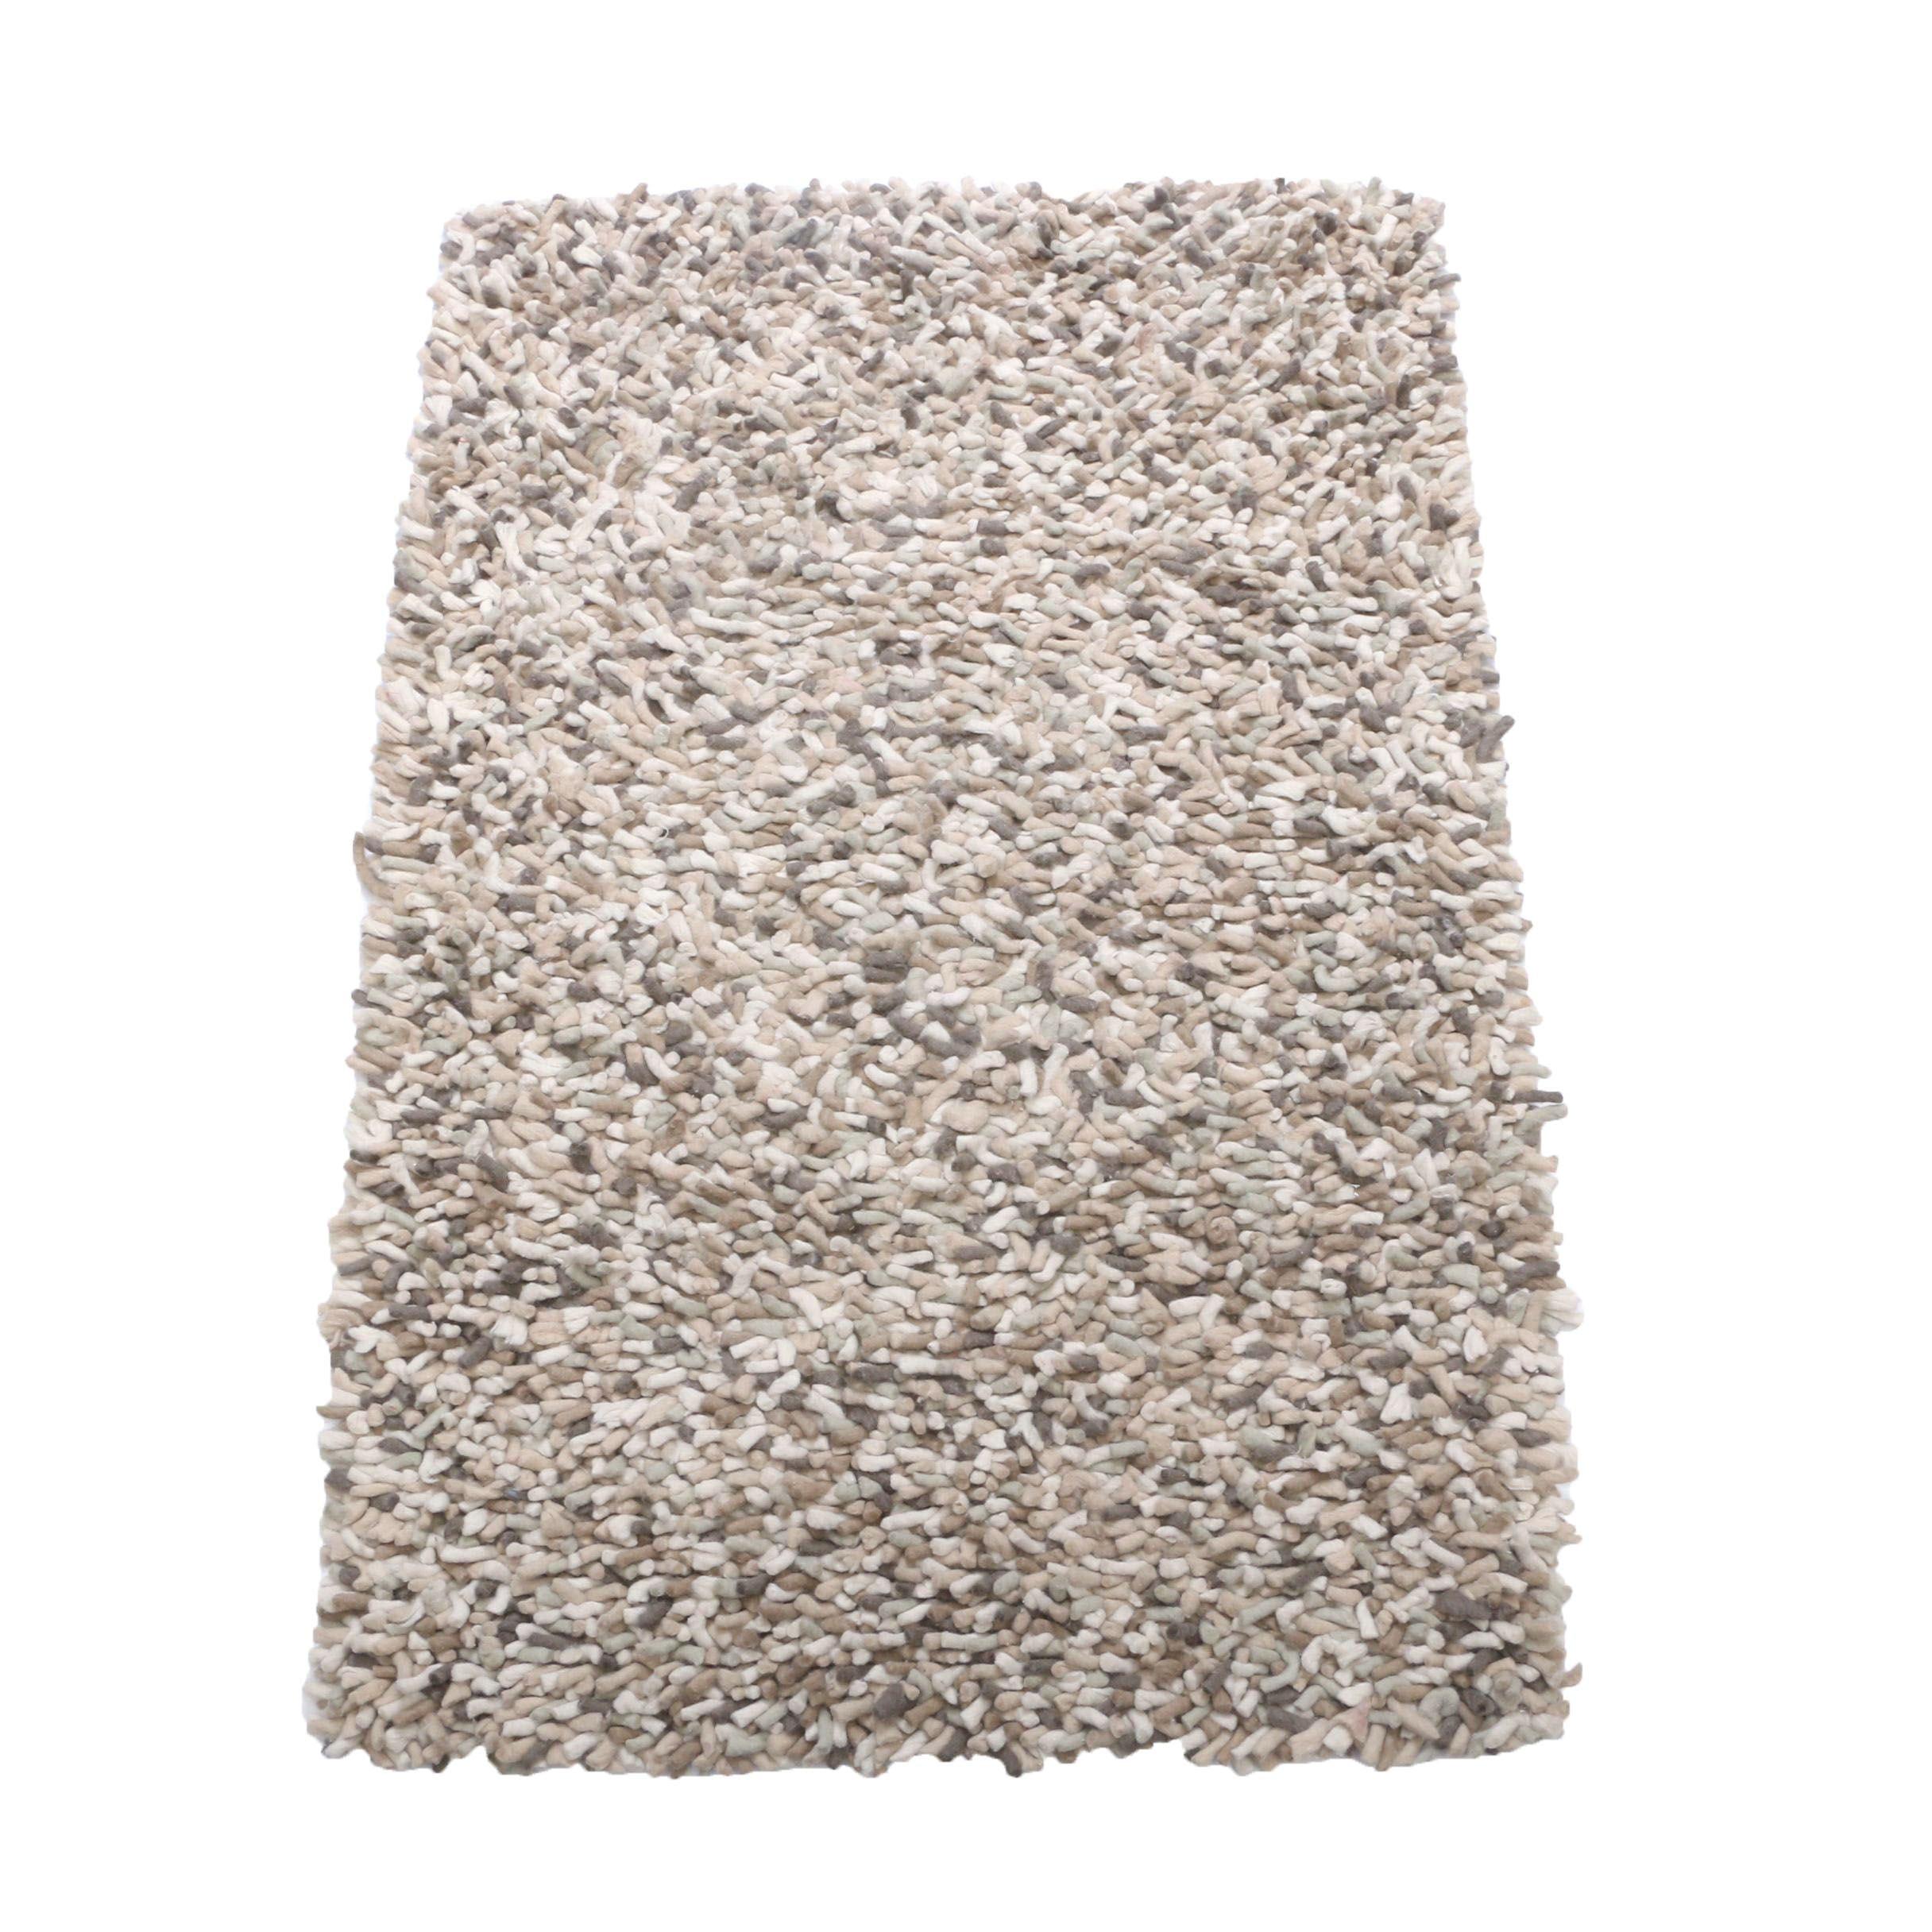 Felted Wool Shag Area Rug